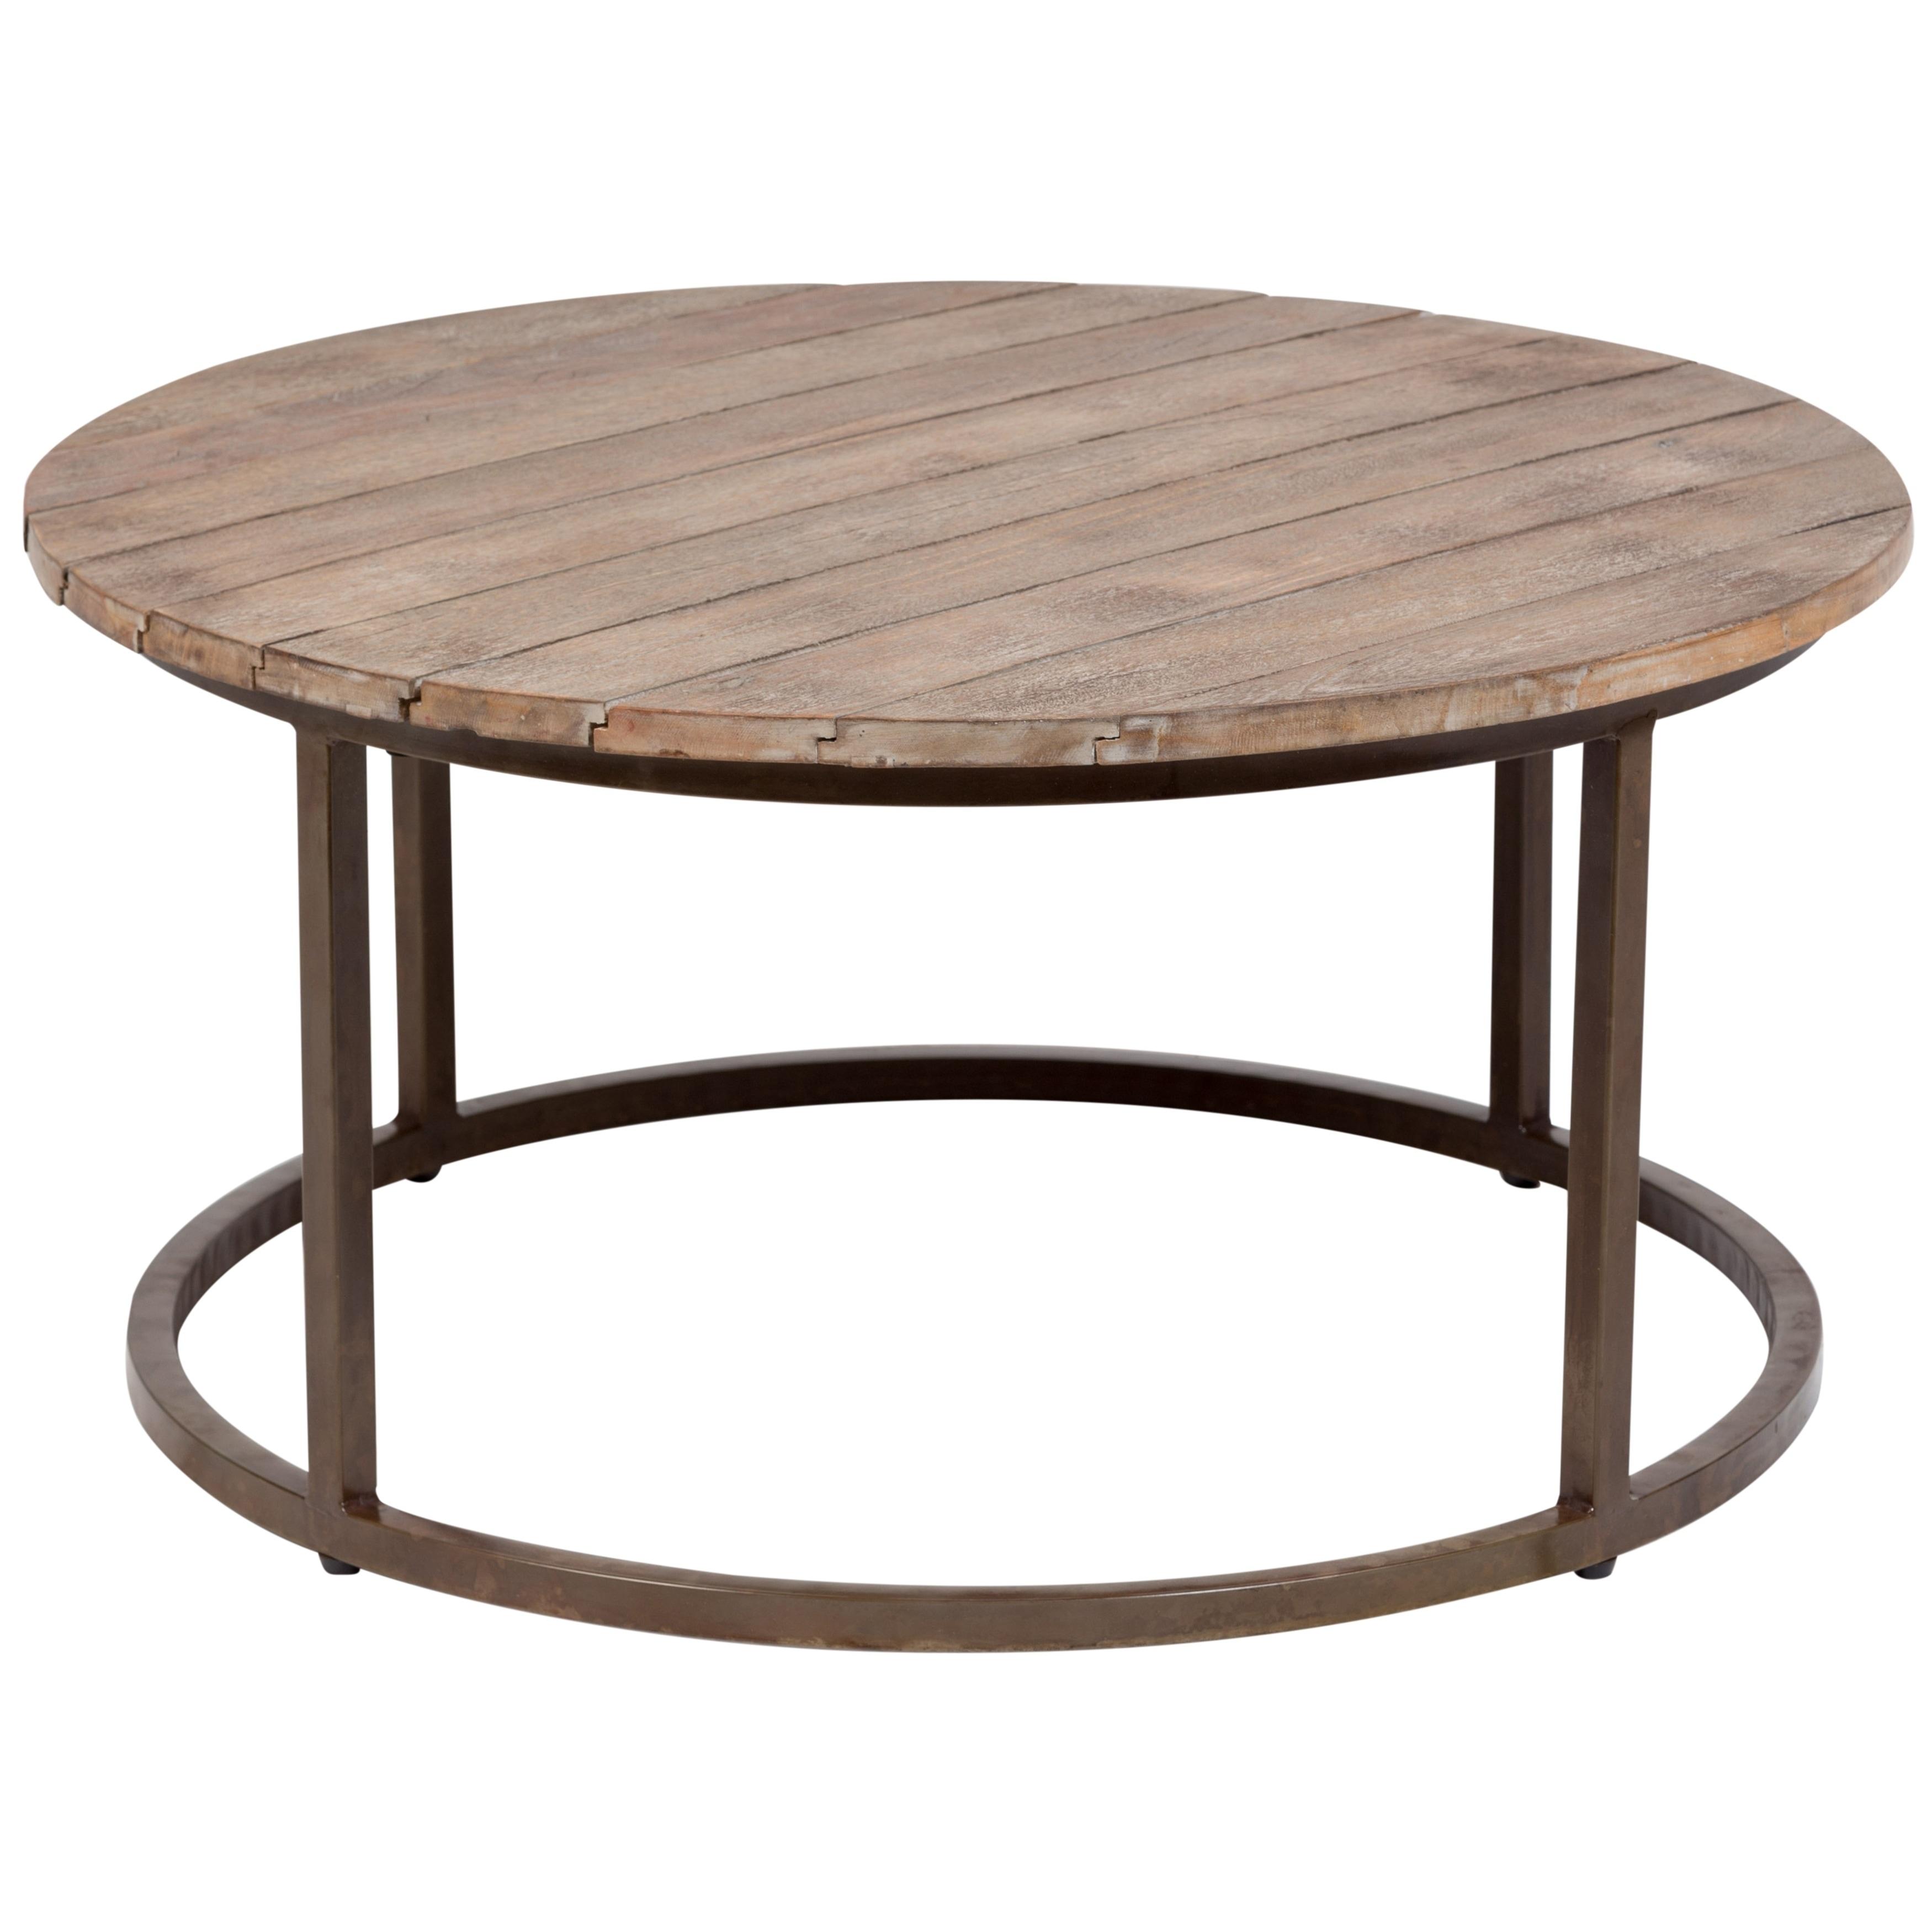 - Shop Handmade Broomfield Rustic Coffee Table - 36